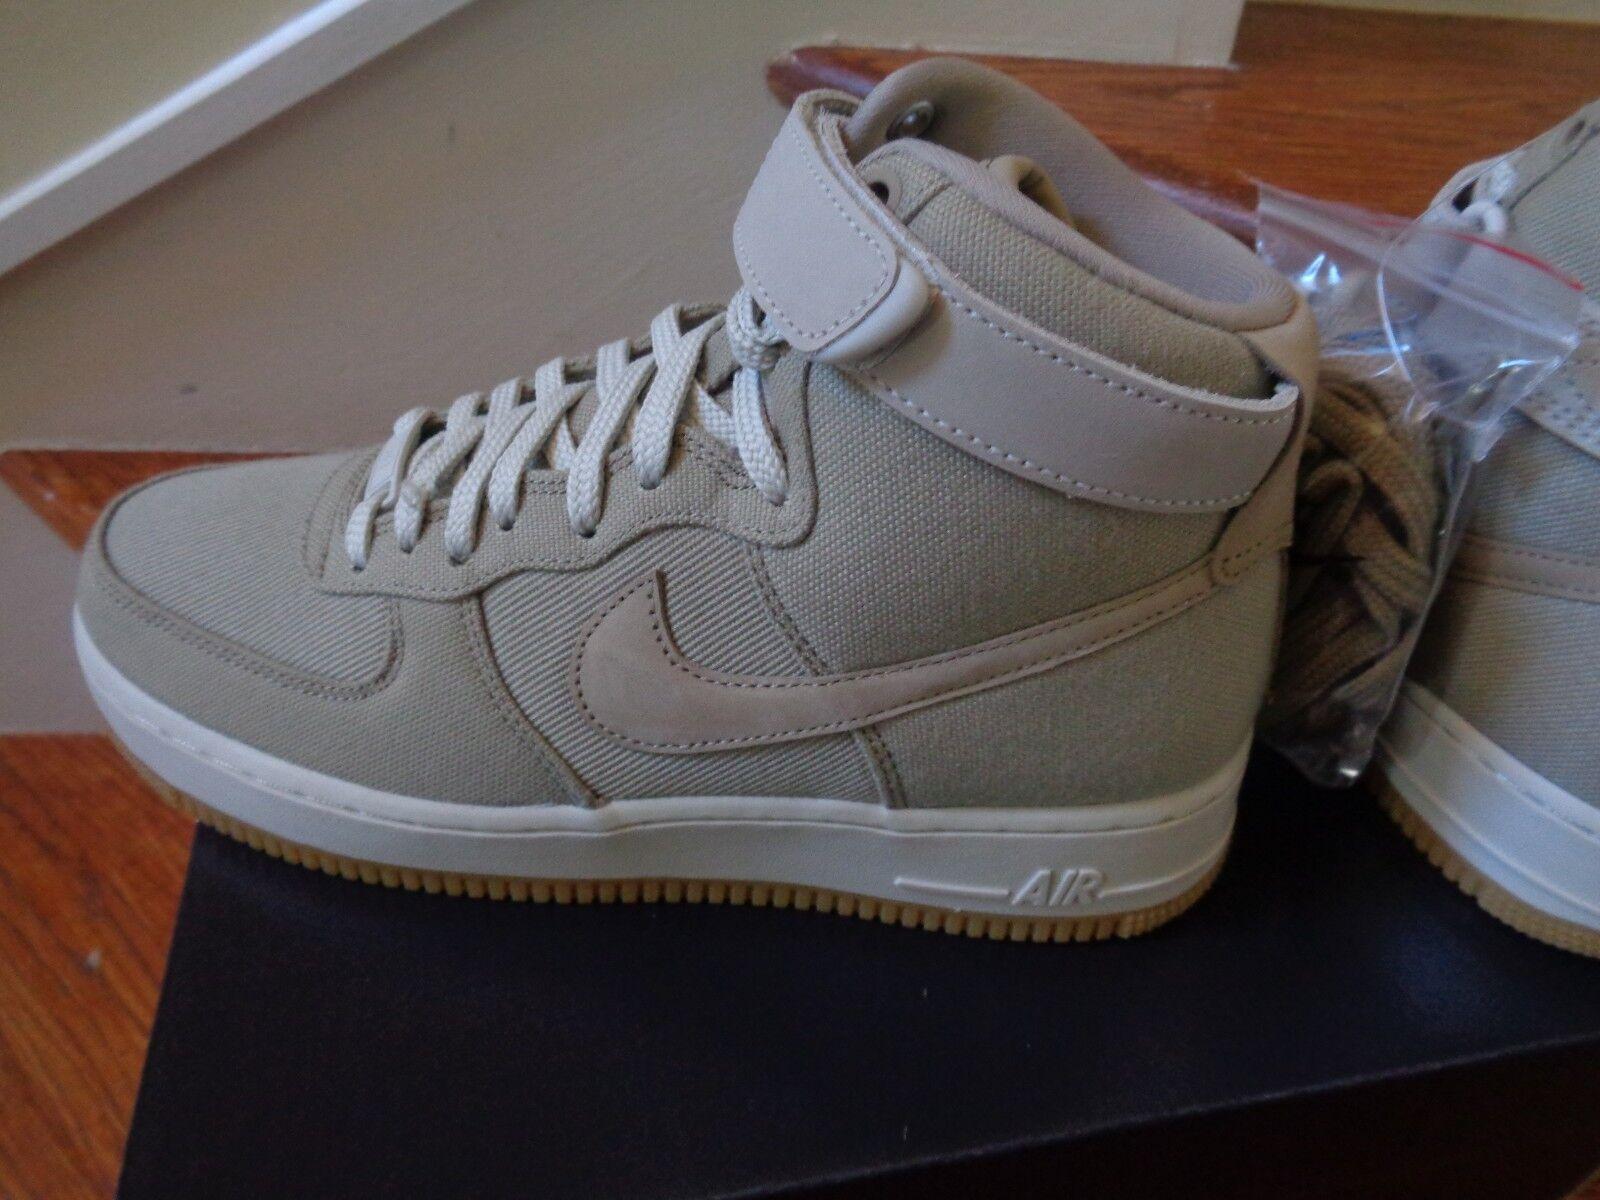 WMNS Nike Air Force 1 HI UT Women's Boots, AJ2775 200 Size 8.5 NWB